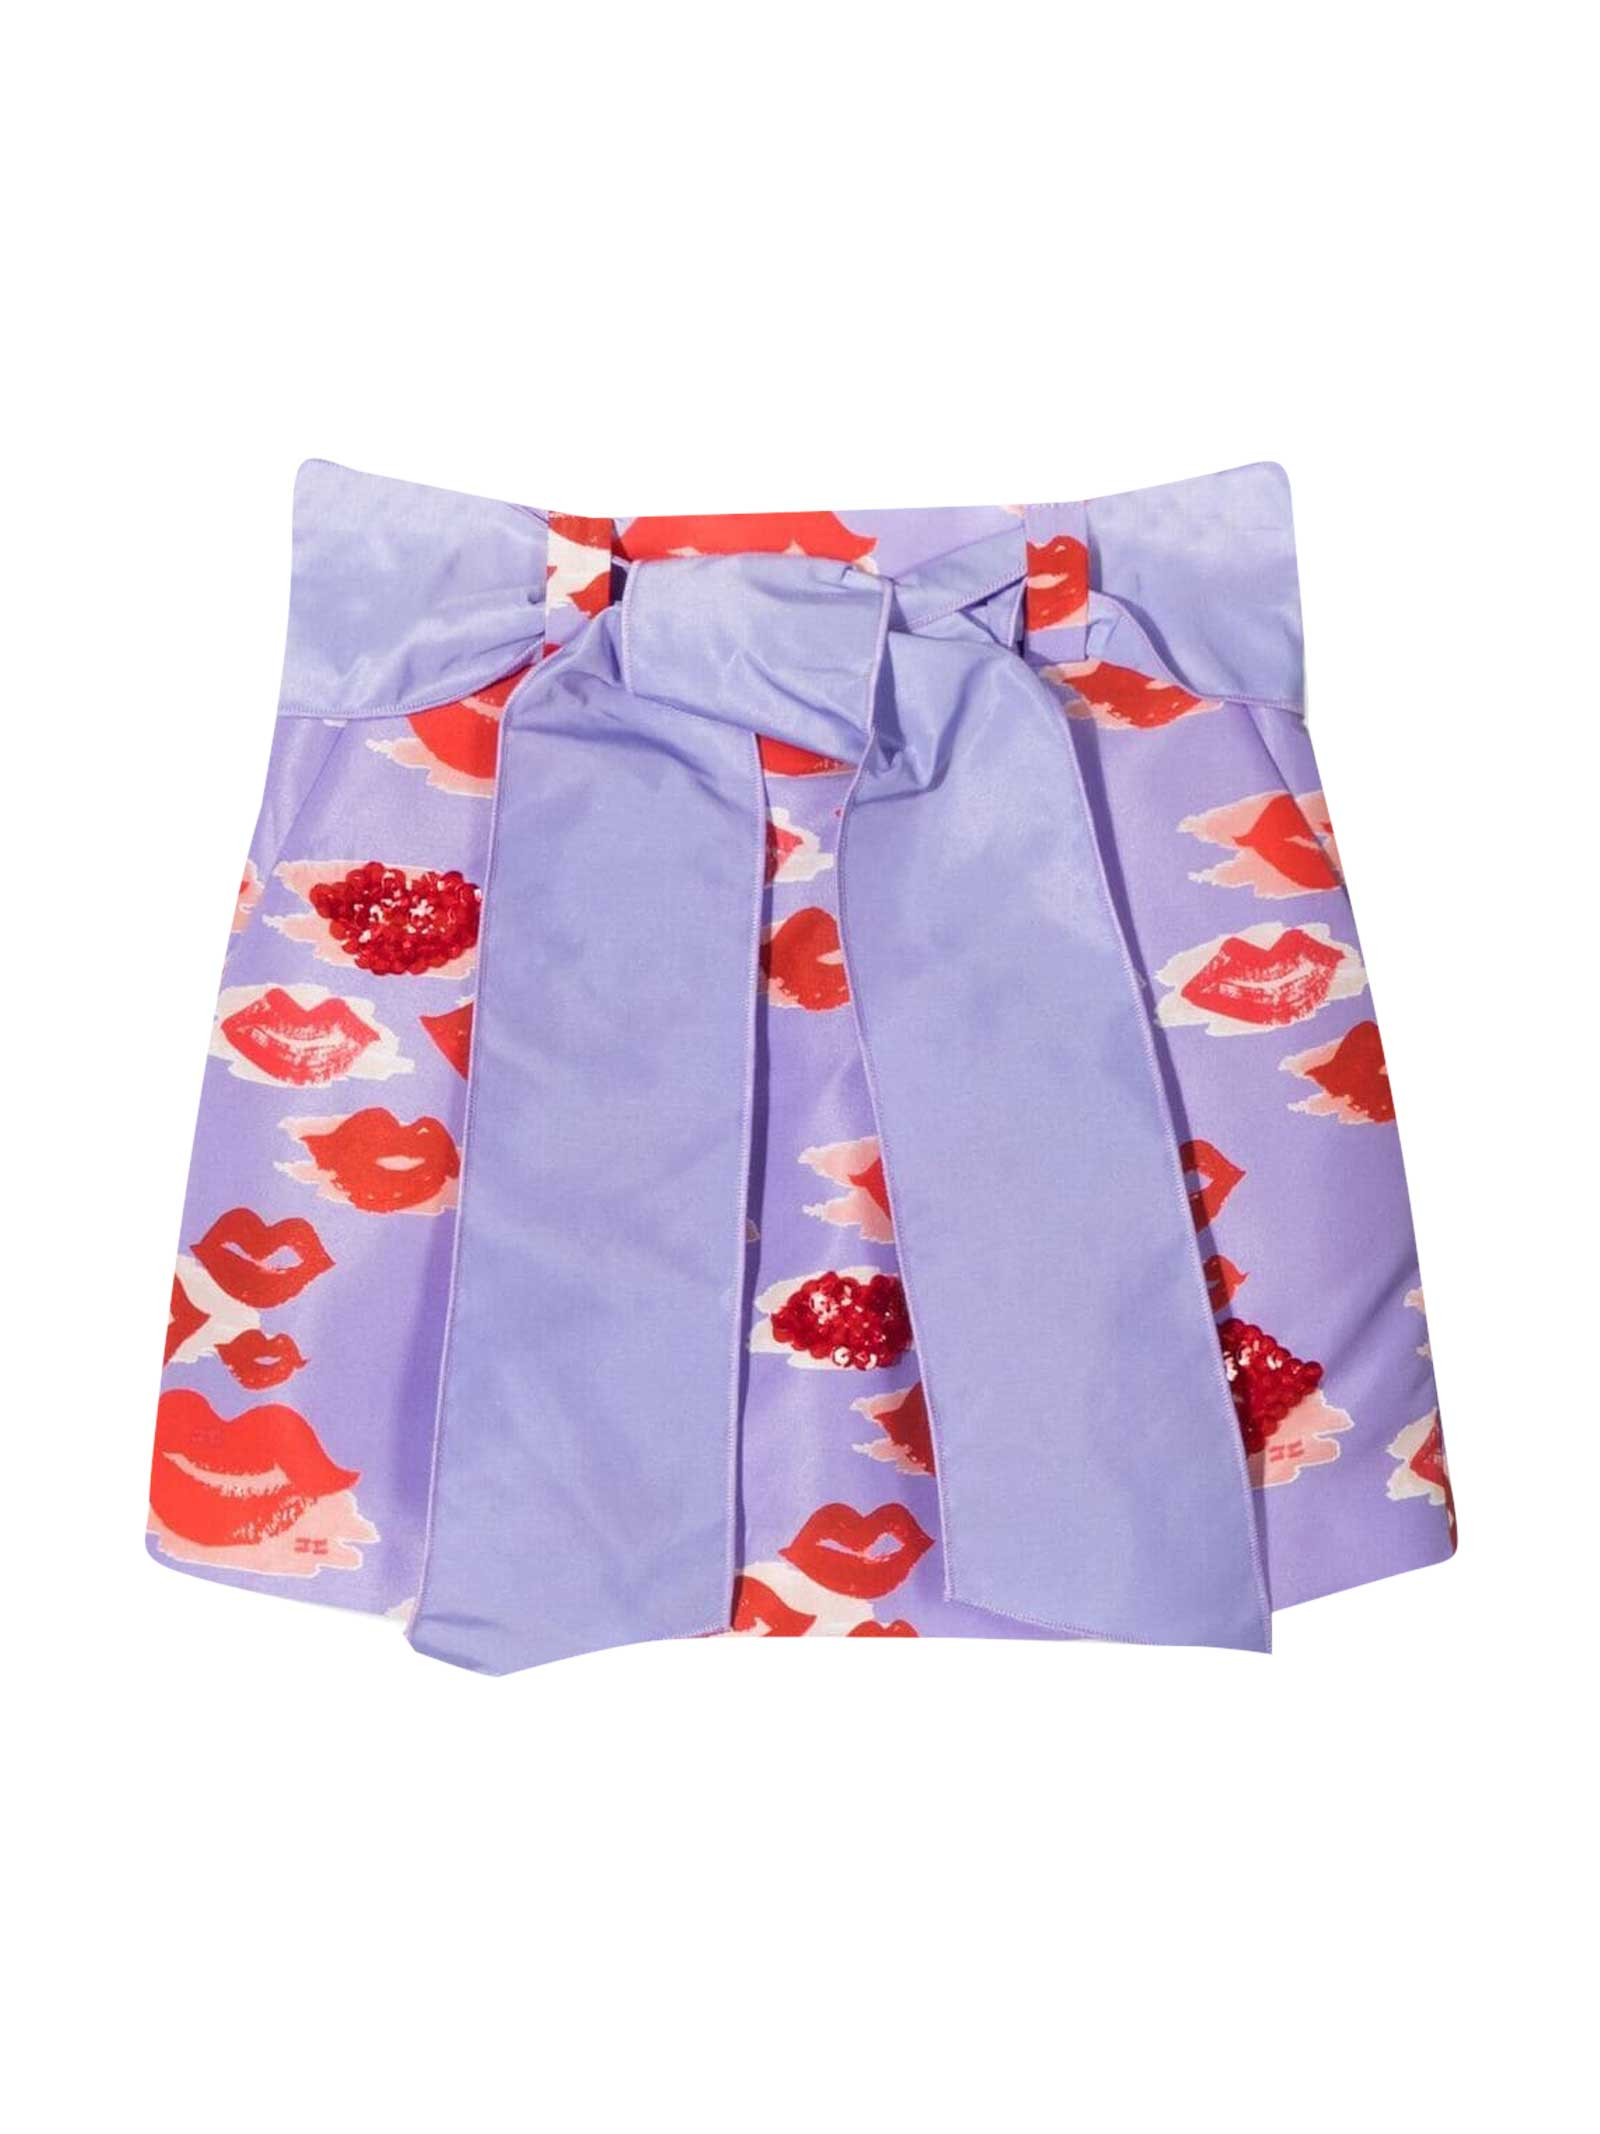 Miniskirt With Elisabetta Franchi My Girl Print